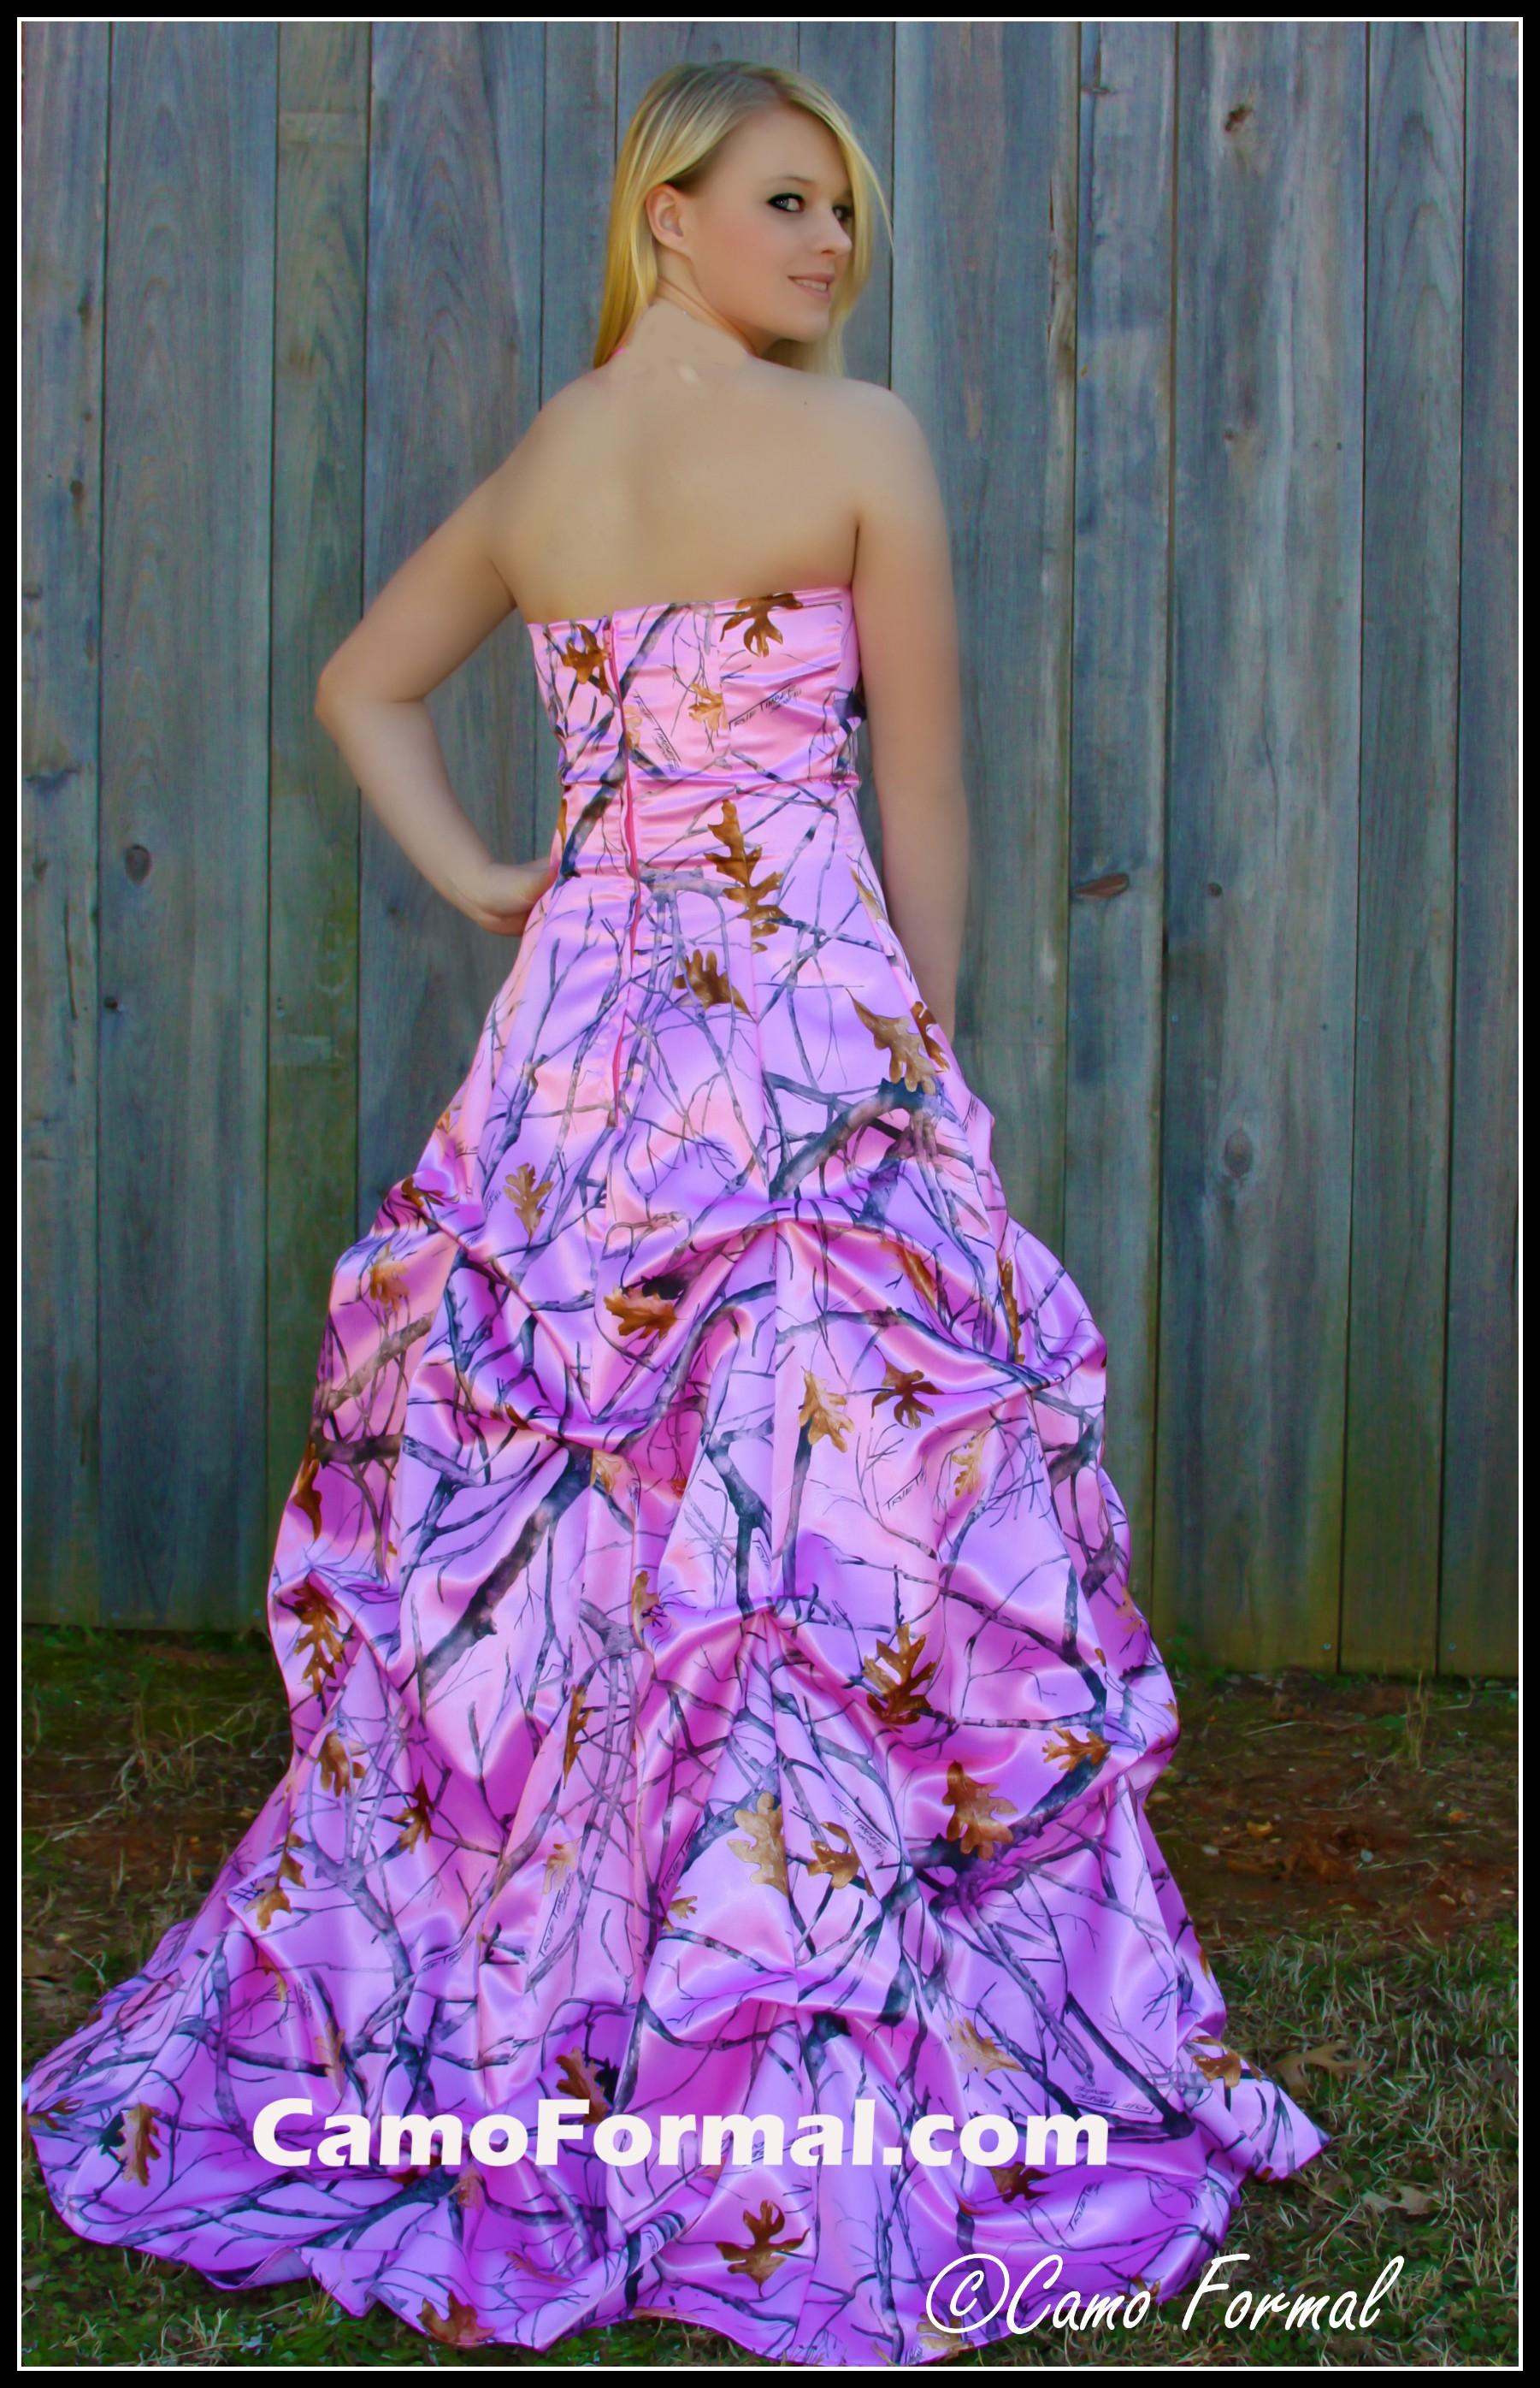 Mossy oak new breakup attire camouflage prom wedding for Pink camo wedding dresses